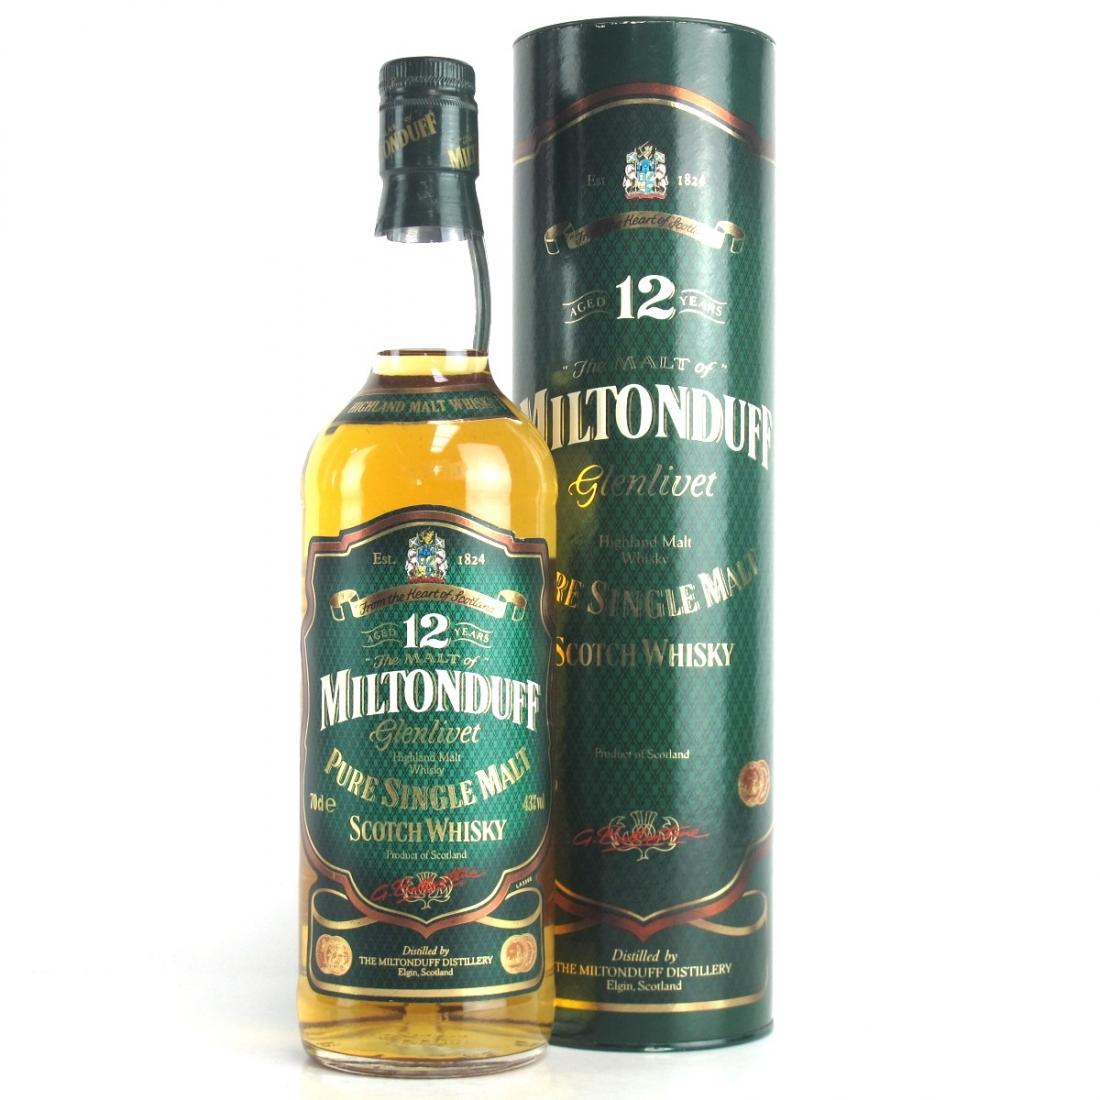 Miltonduff 12 Year Old